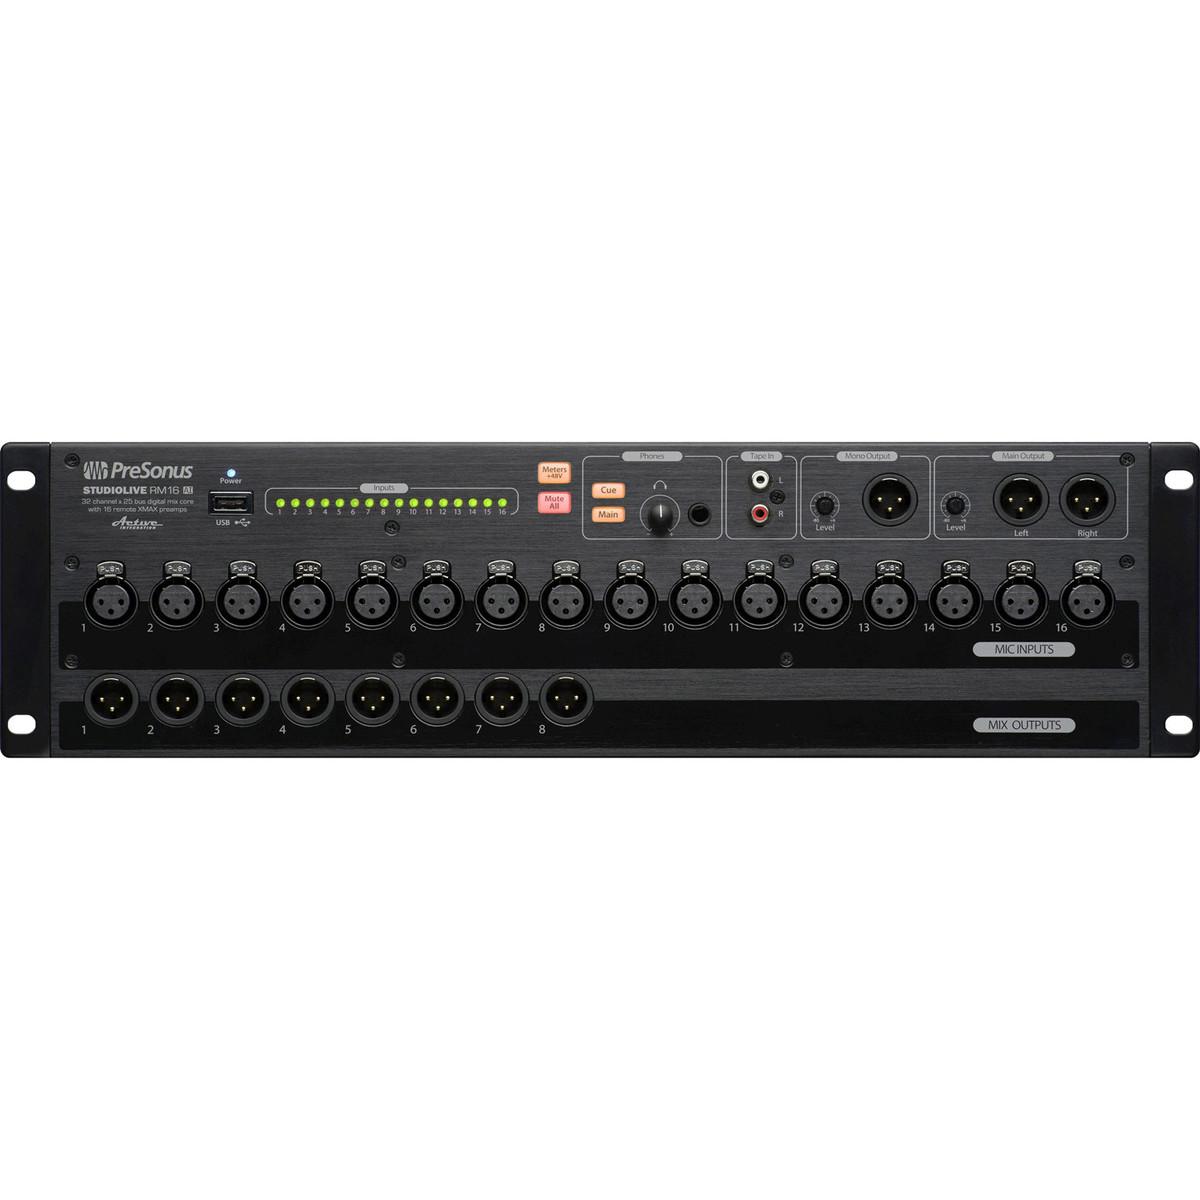 disc presonus rm16ai rack mount software controlled digital mixer at gear4music. Black Bedroom Furniture Sets. Home Design Ideas